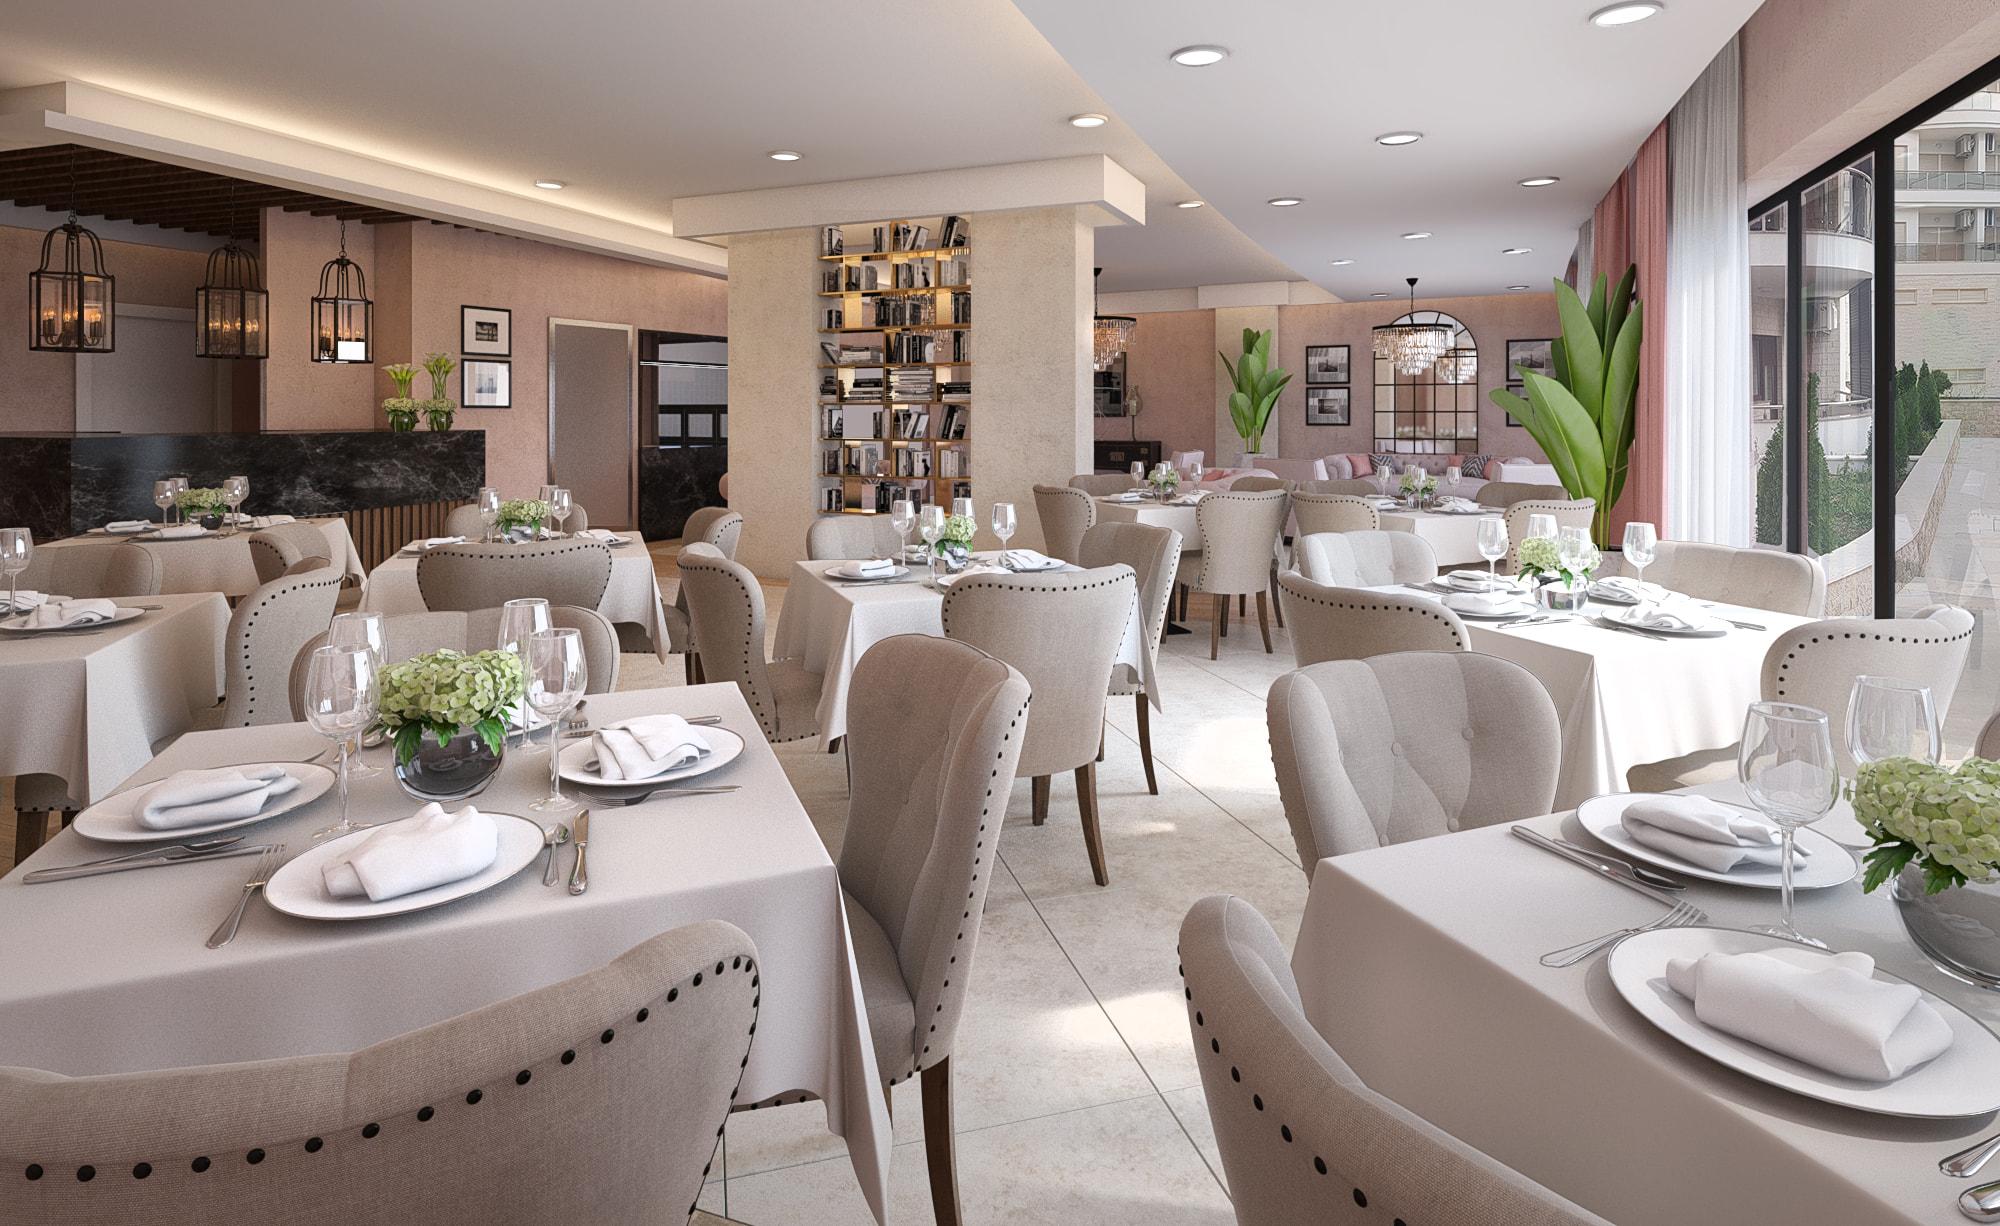 Restaurant in Montenegro ANATOLIA Lounge Cafe Becici - Budva.jpg